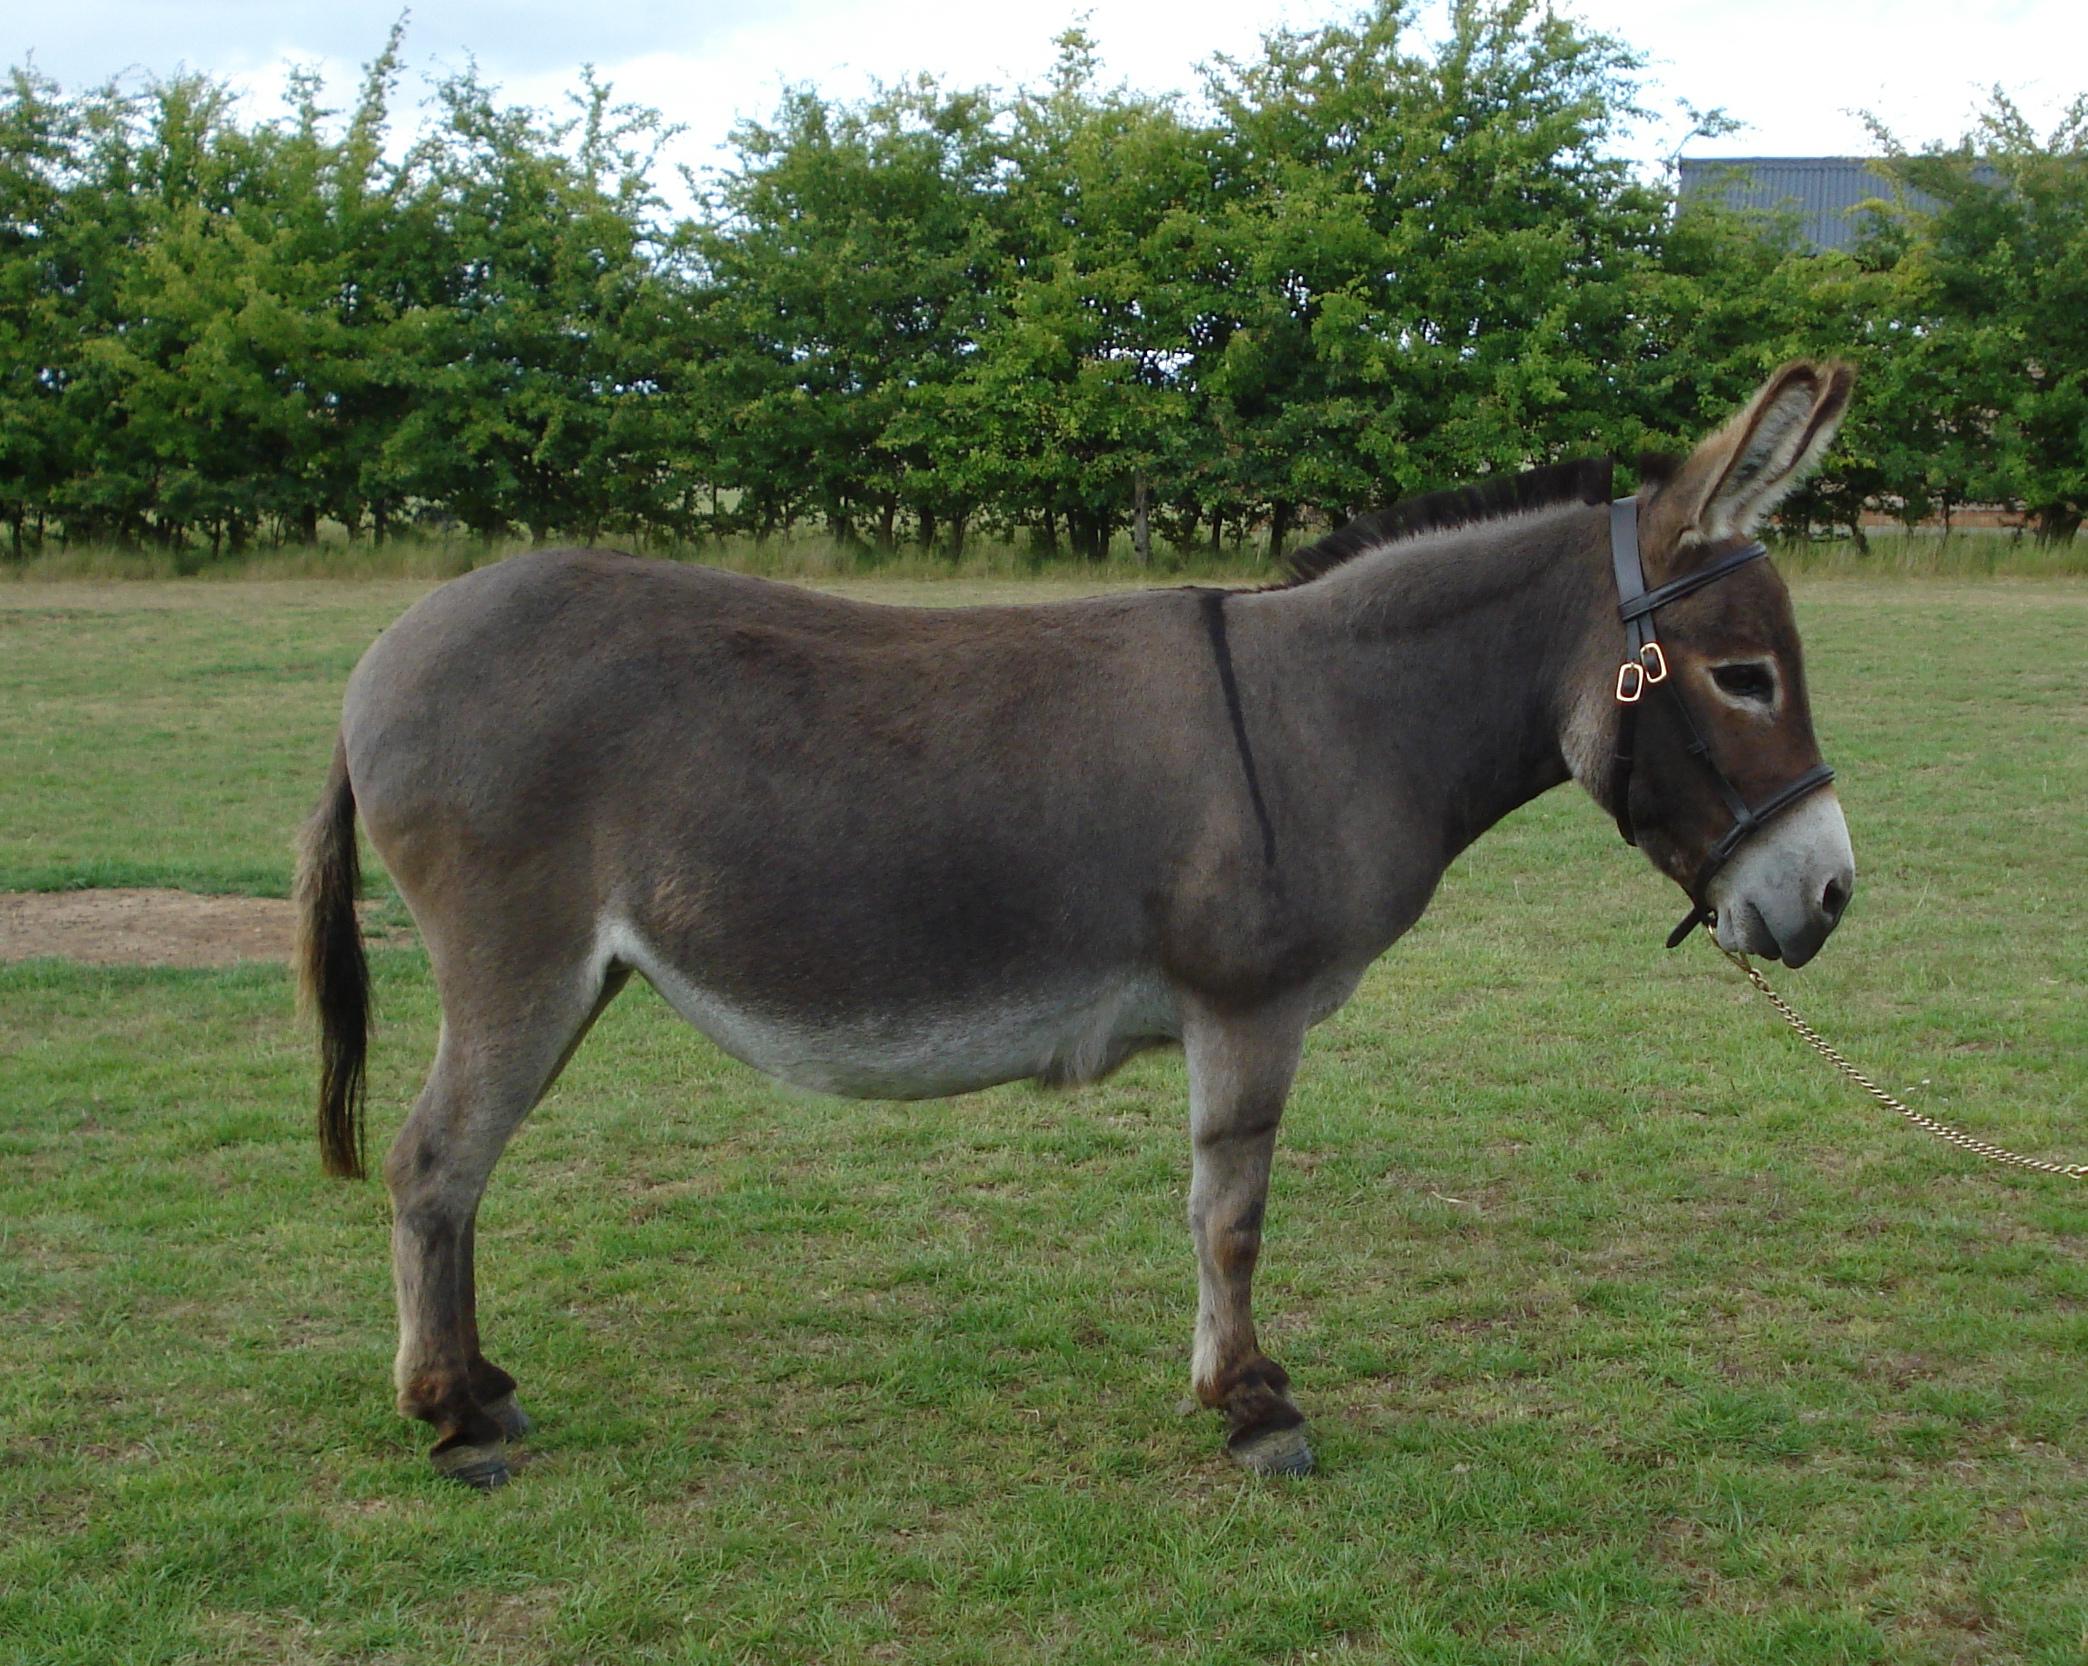 the donkey by renske van steensel infographic